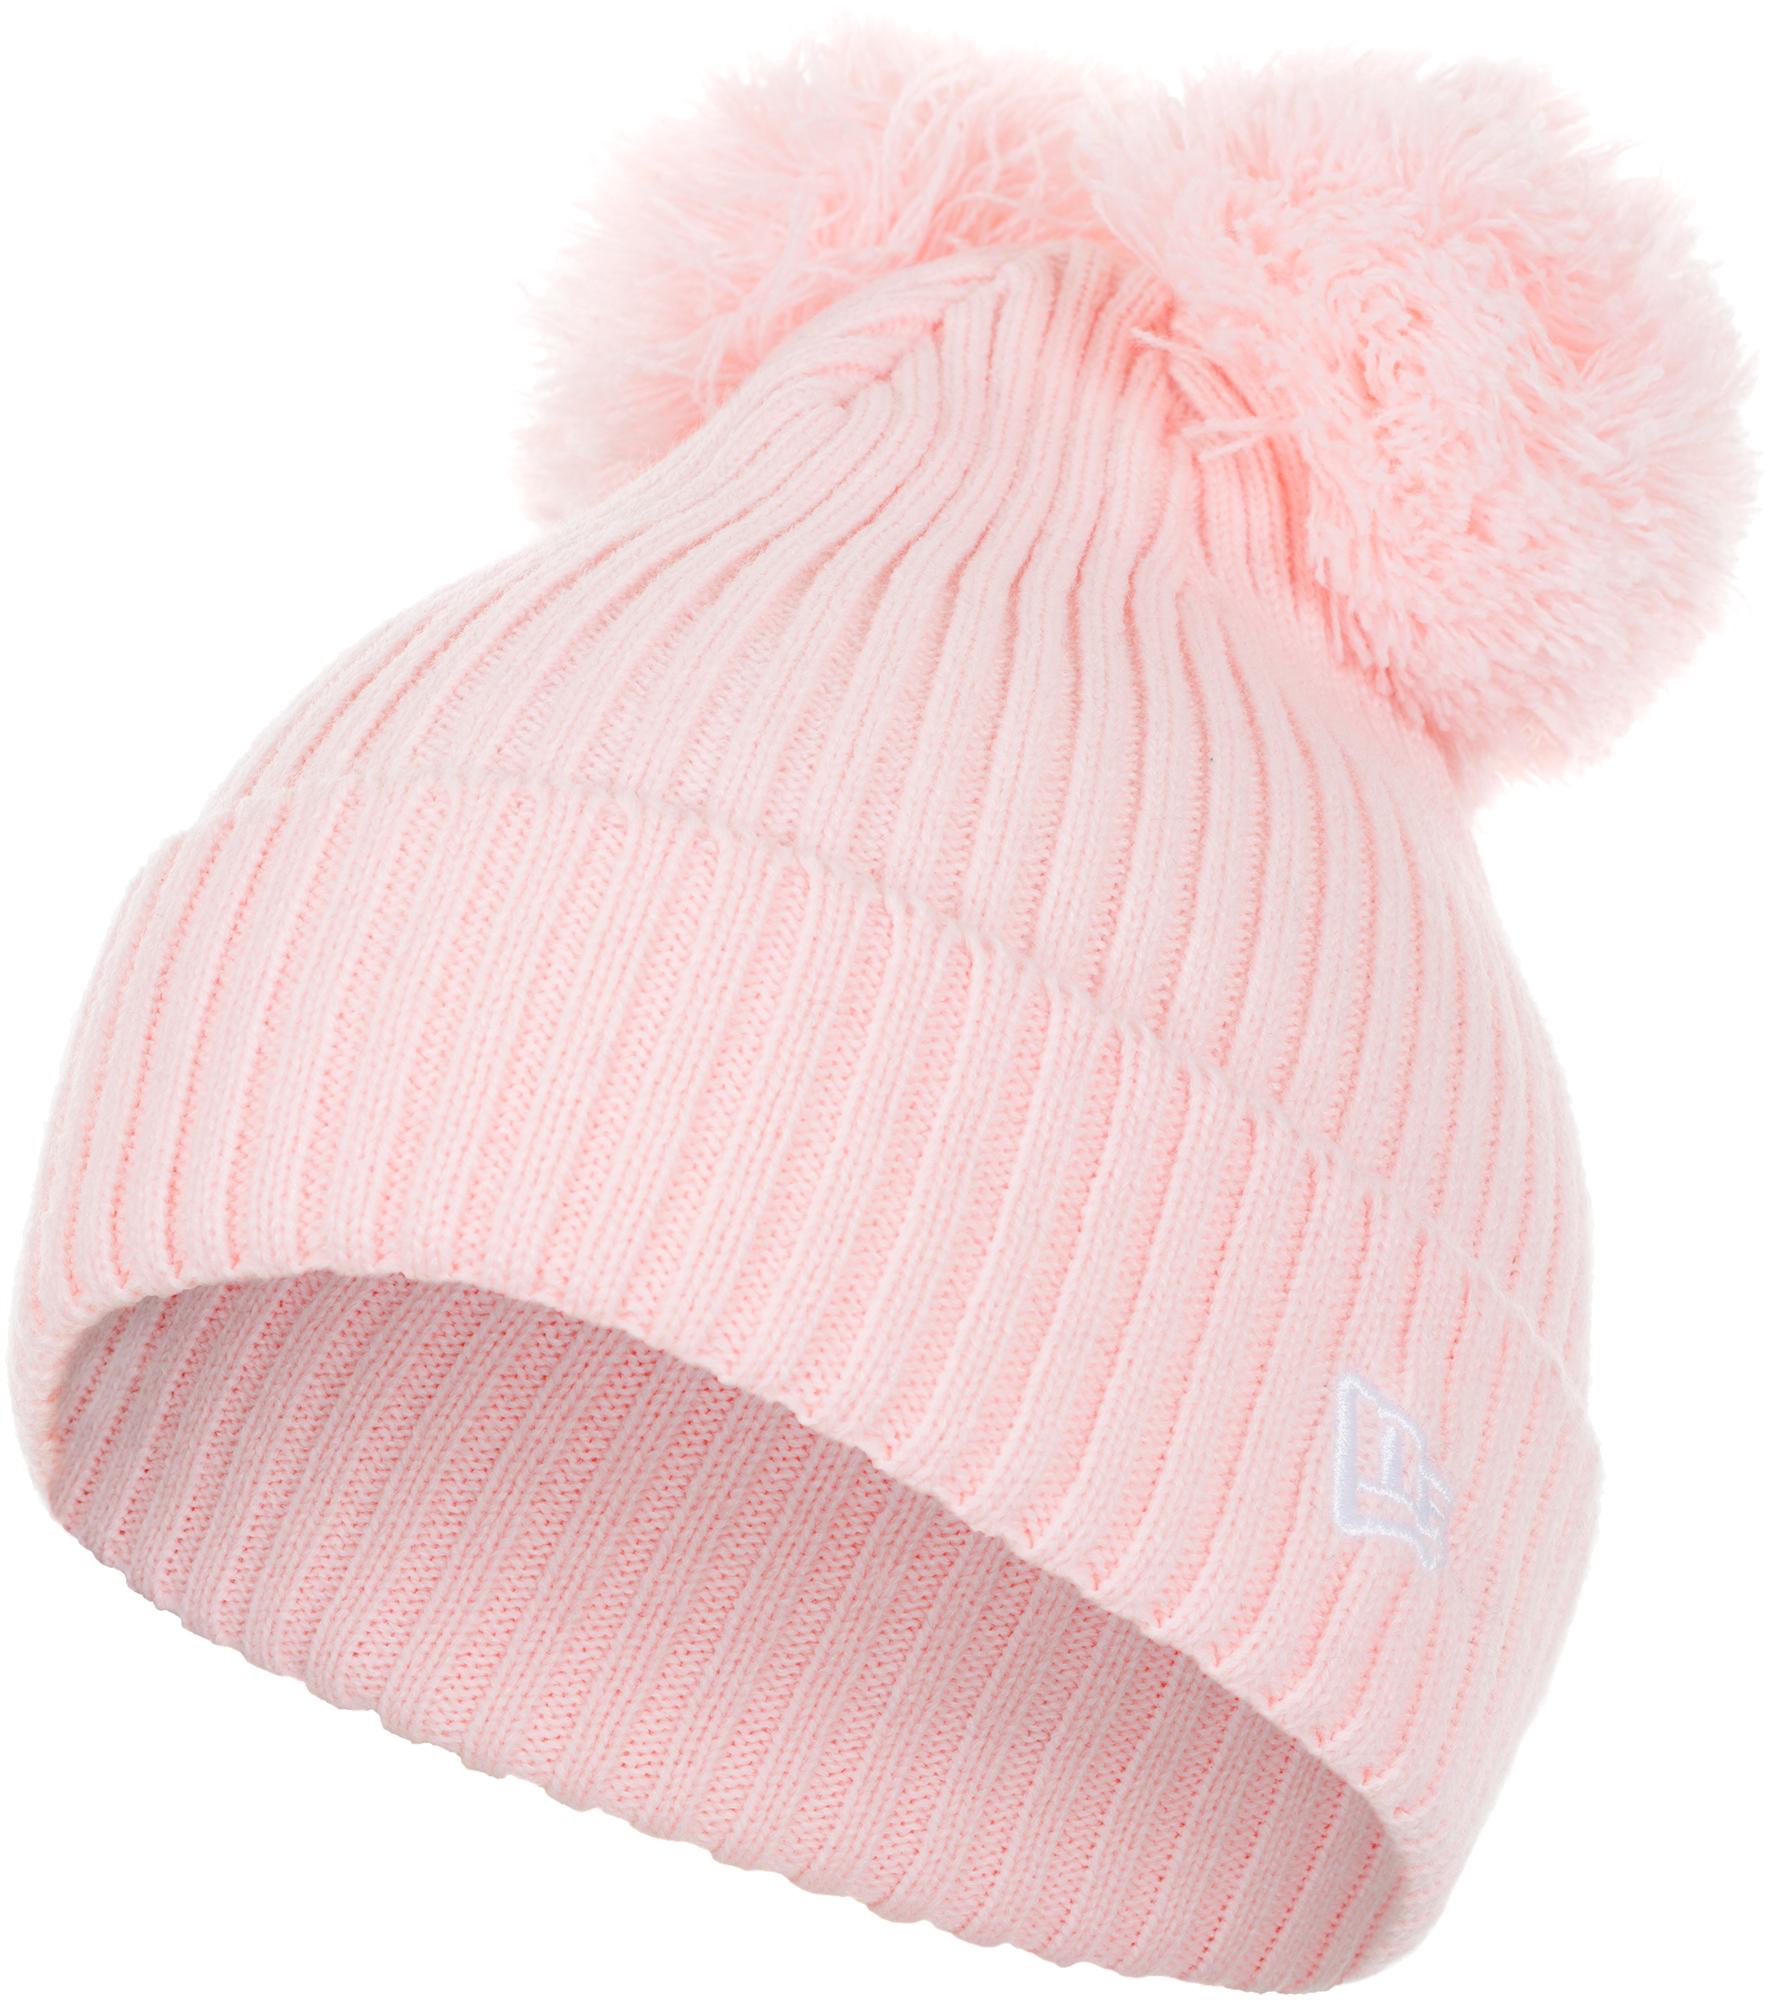 New Era Шапка для девочек New Era Lic 875 Double Pom Cuff Knit, размер 54-55 new era шапка для мальчиков new era ne cuff pom размер 54 55